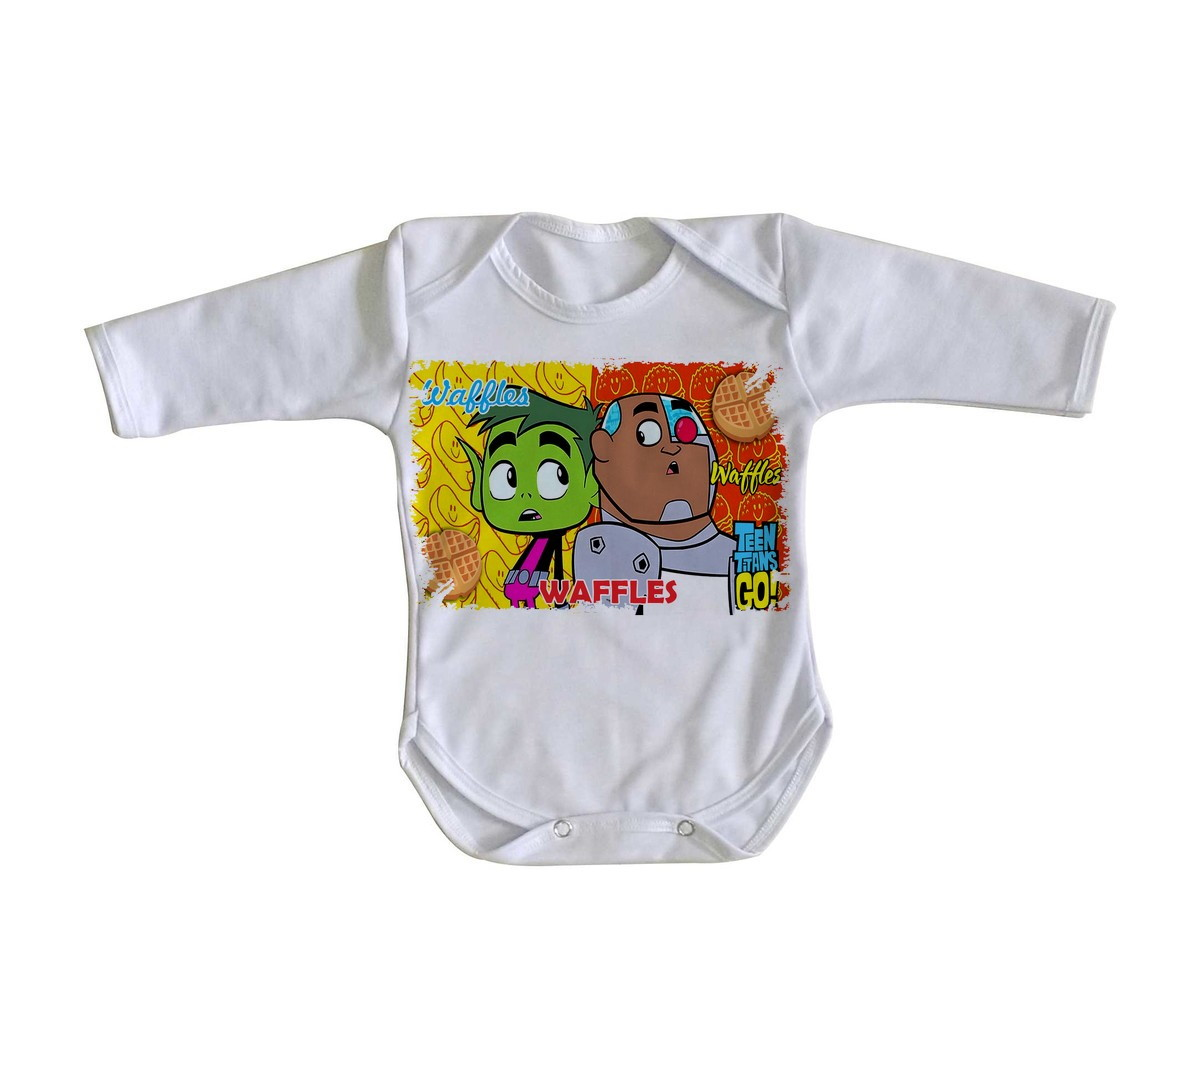 ba9942e056 Body bebê roupa nenê Jovens Titãs waffles titans go no Elo7 ...